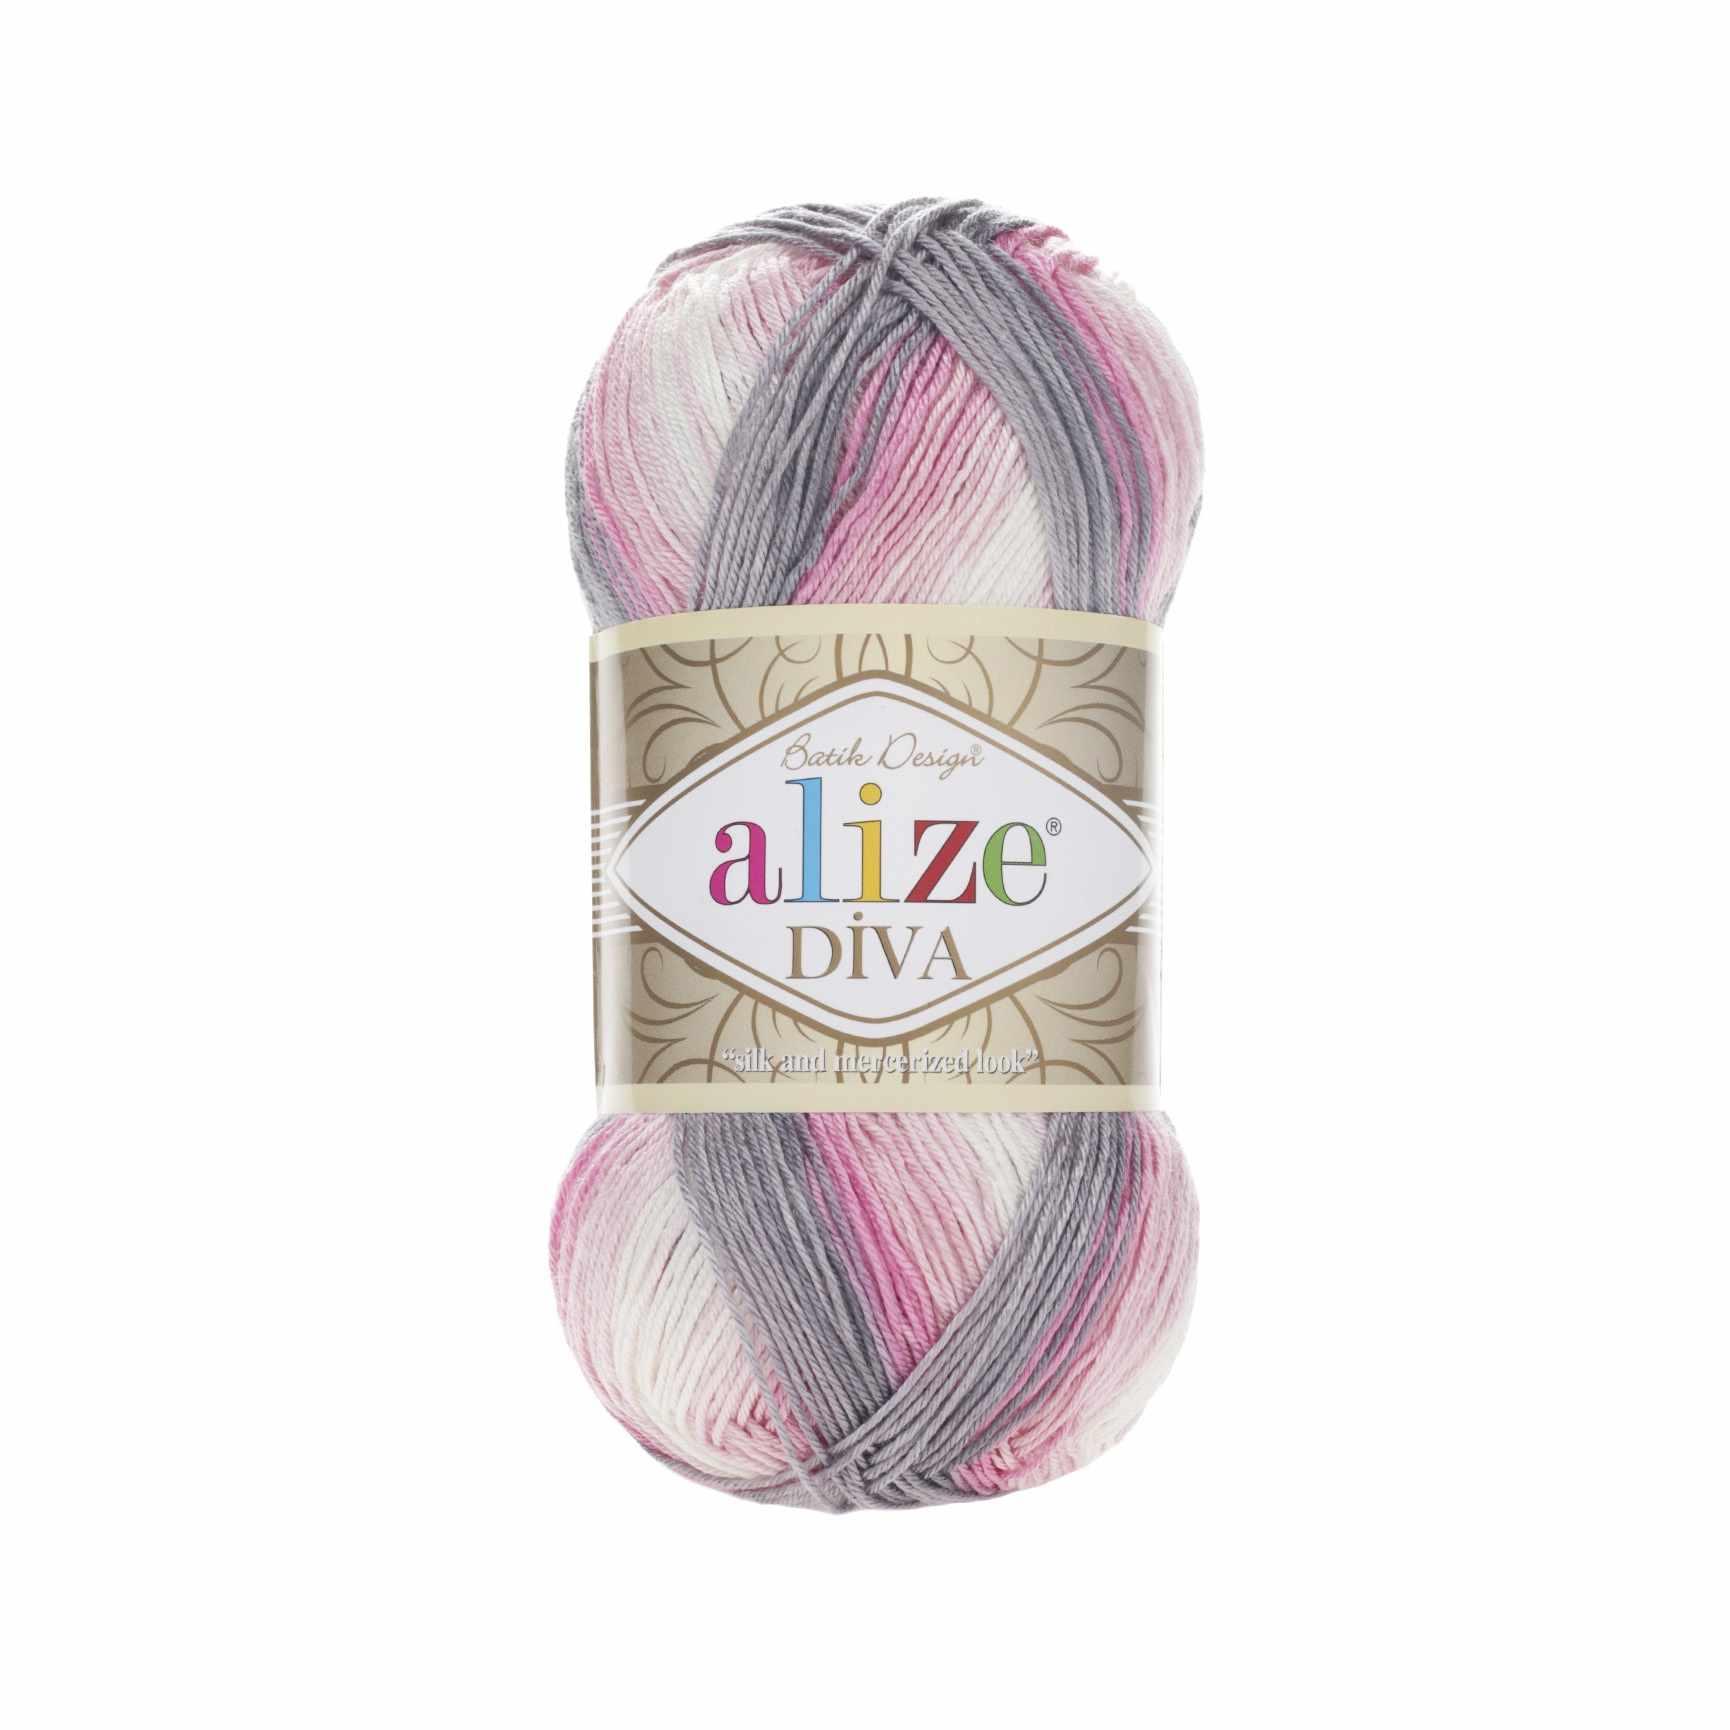 Пряжа Alize Diva Batik Цвет.3245 сер.роз.бел